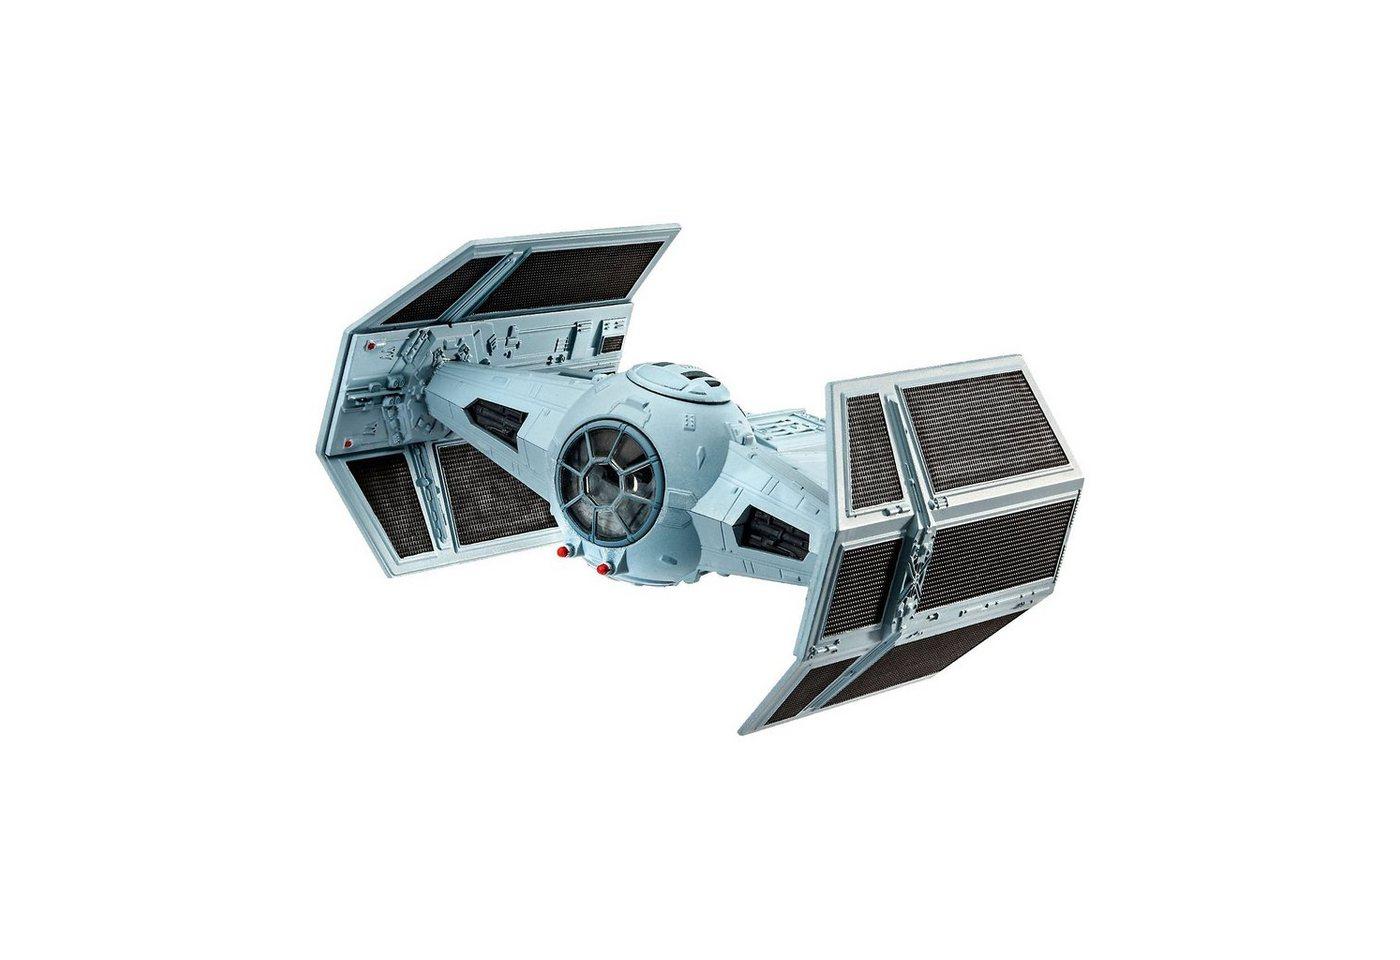 Revell® Modellbausatz Star Wars Darth Vader´s TIE Figh